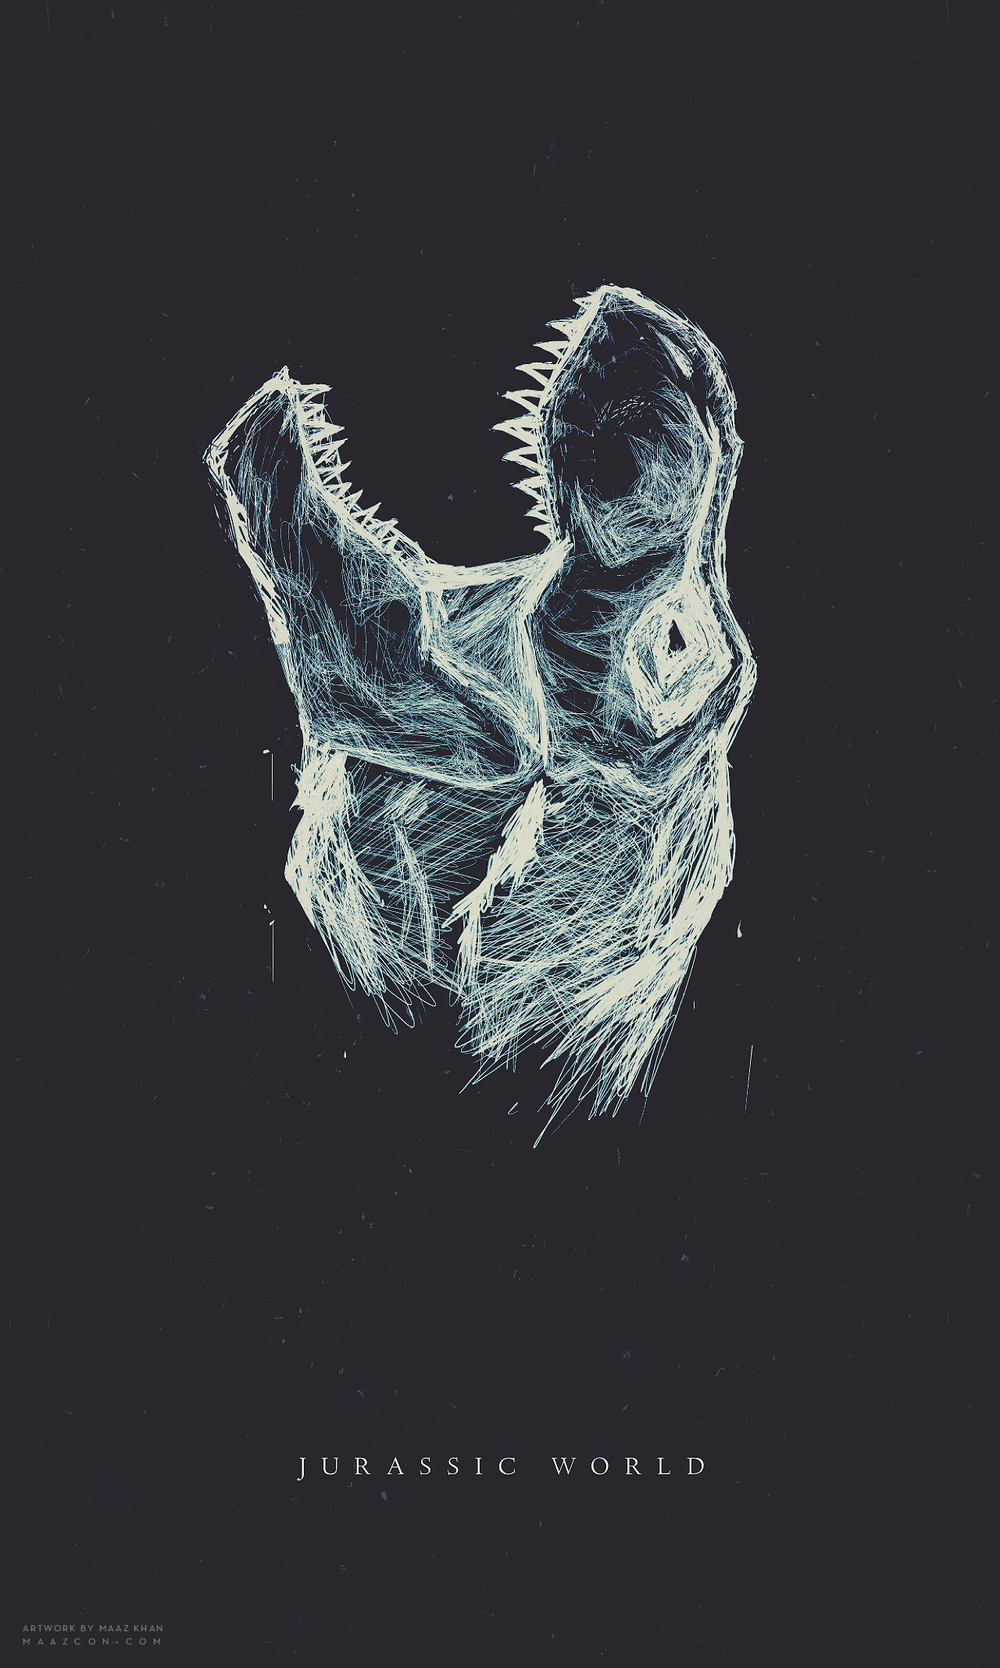 JURASSIC WORLD  [TYRANNOSAURUS]  (2014)